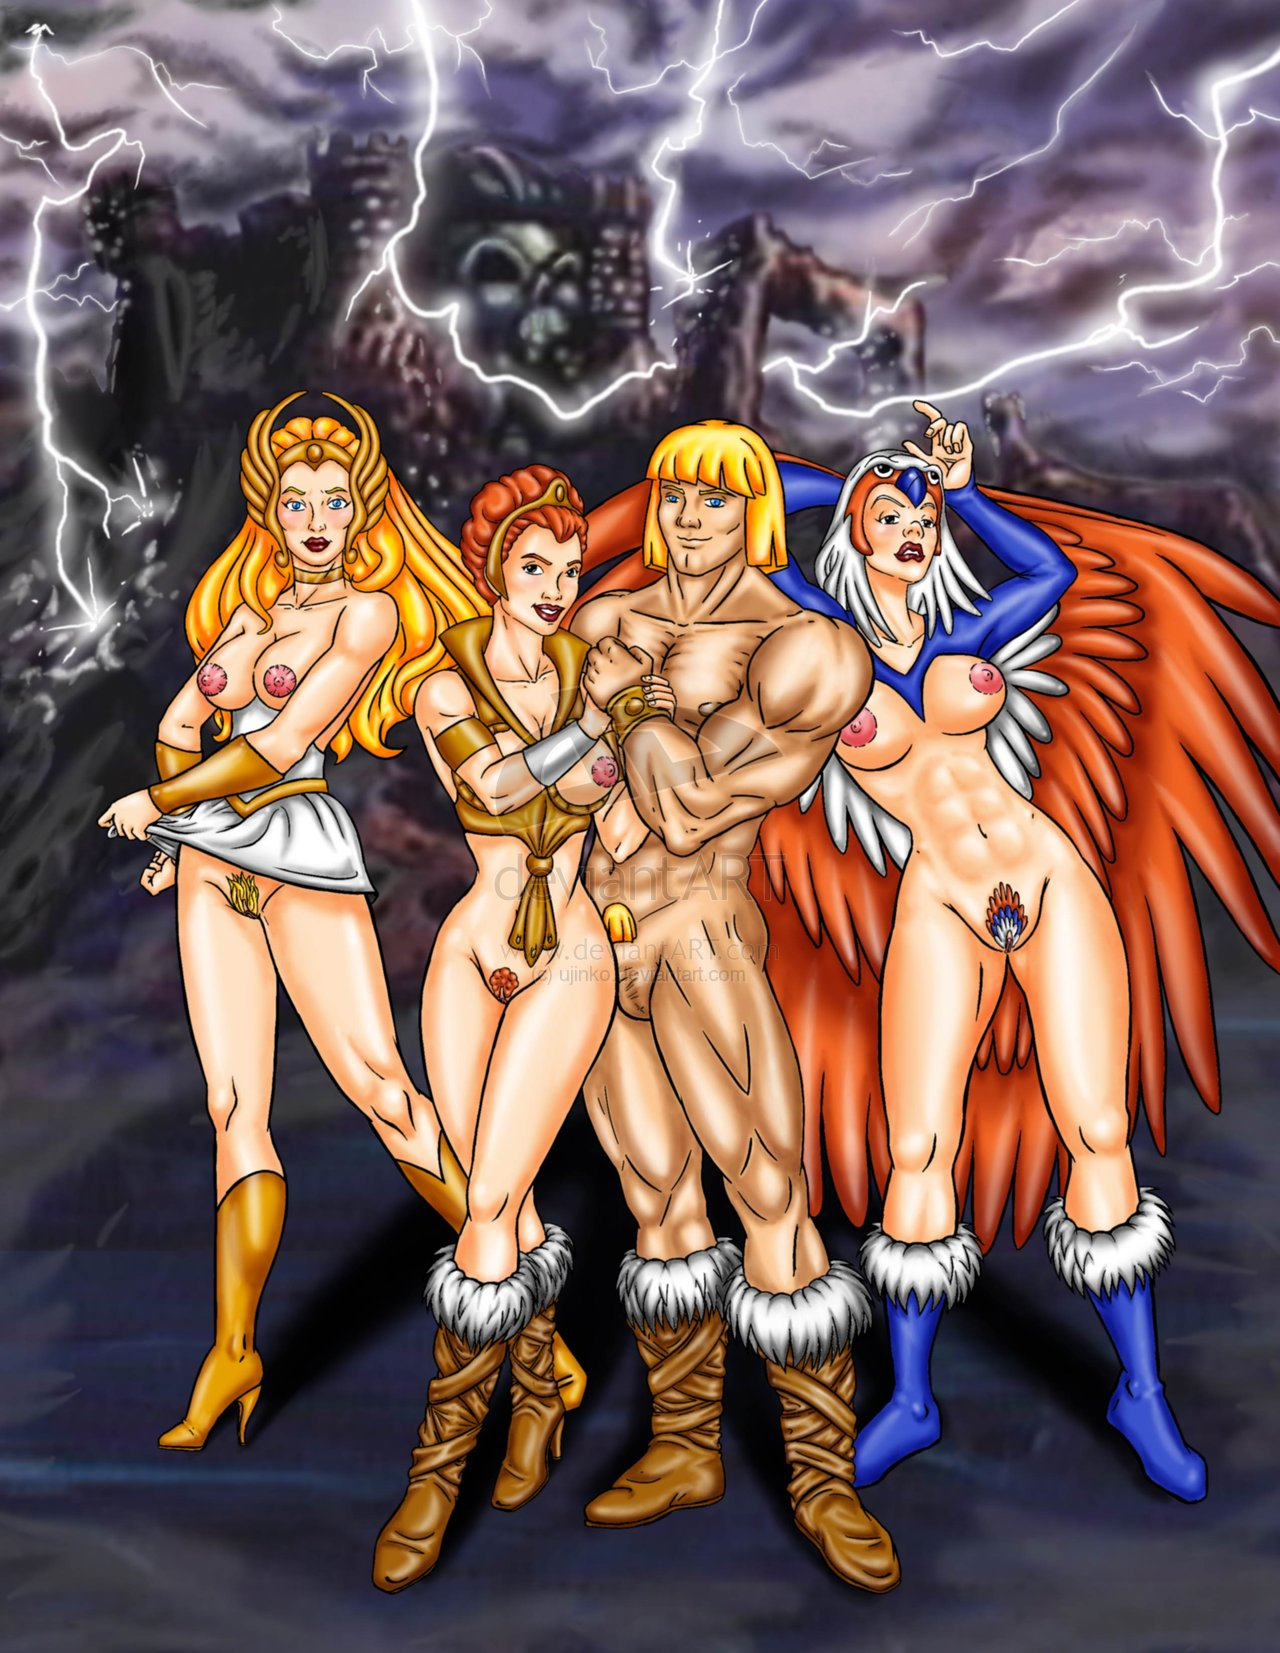 he-man Heaven's lost property porn comic